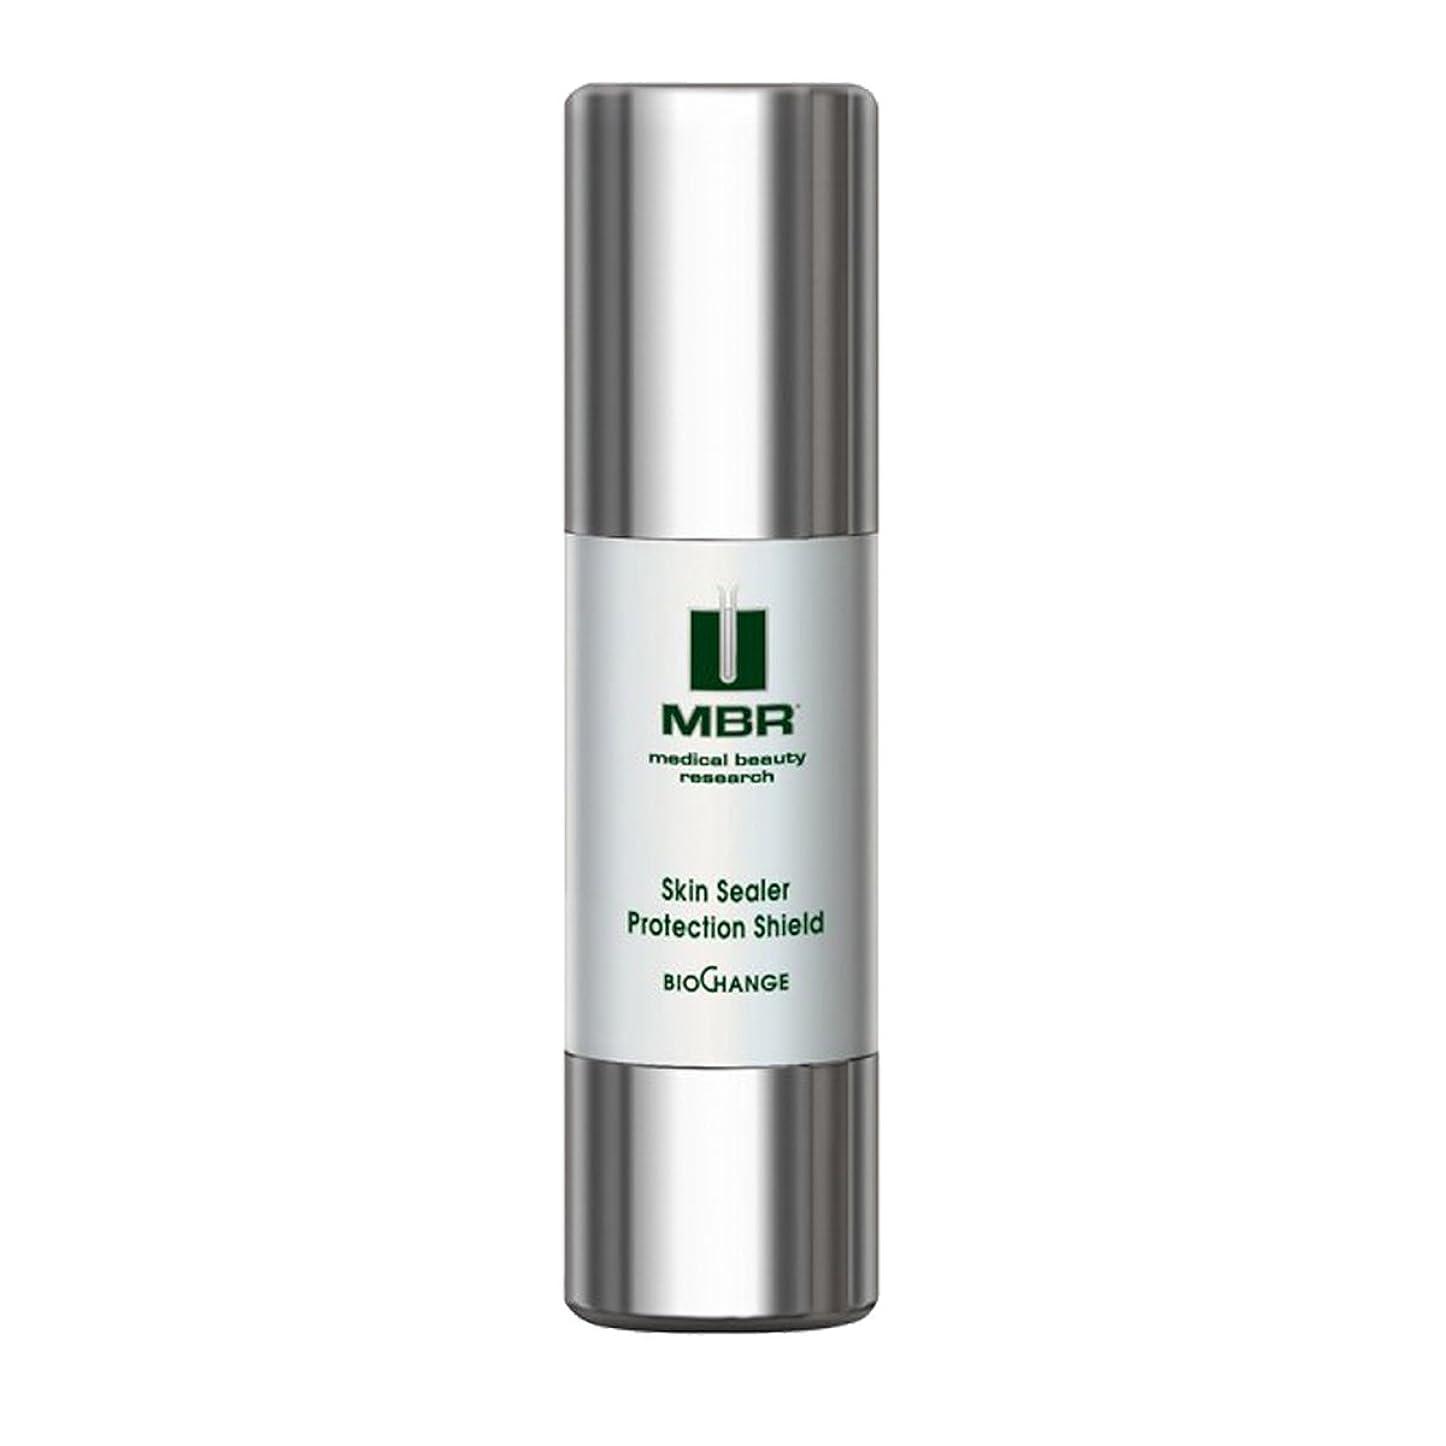 MBR Medical Beauty Research BioChange Skin Sealer Protection Shield 30ml/1oz並行輸入品